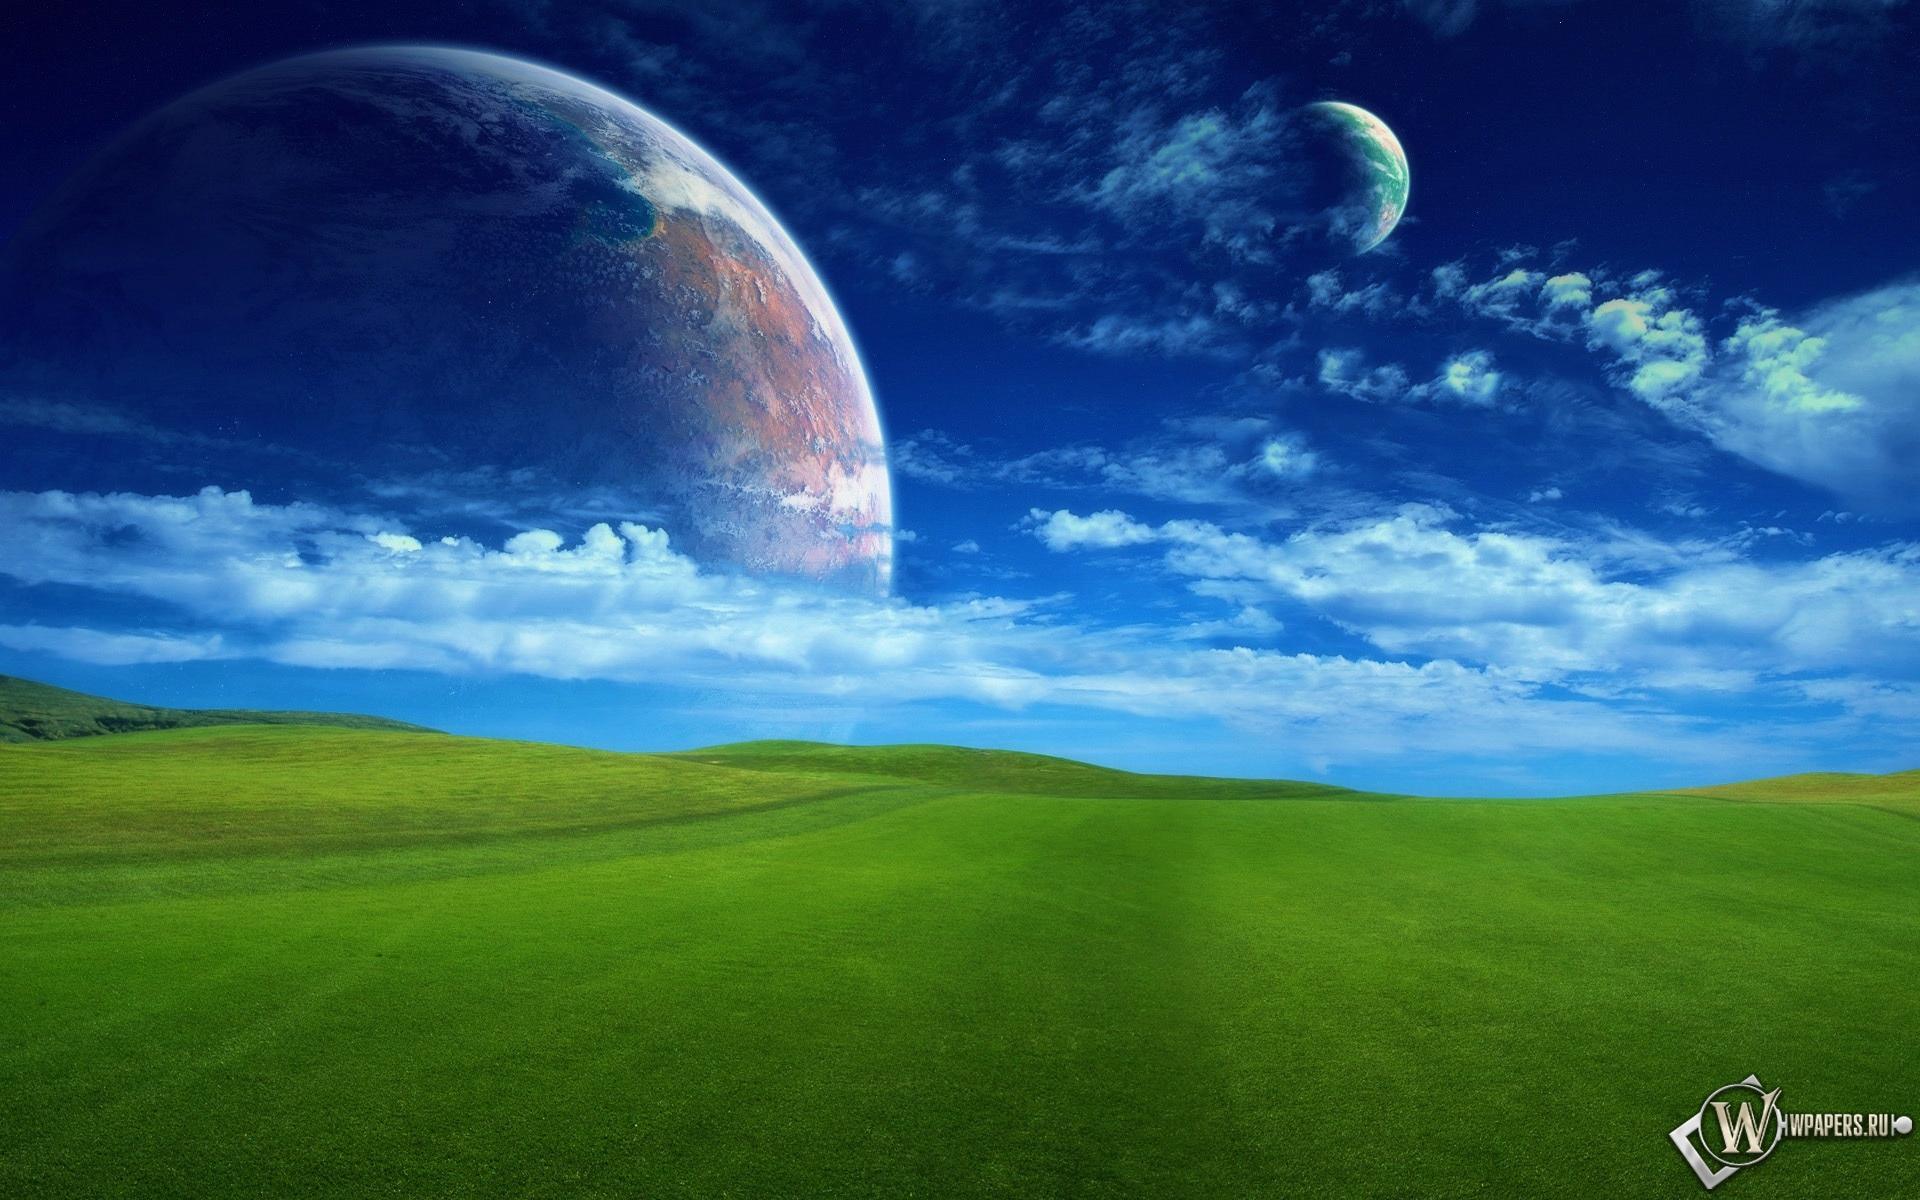 Бескрайнее зеленое поле 1920x1200